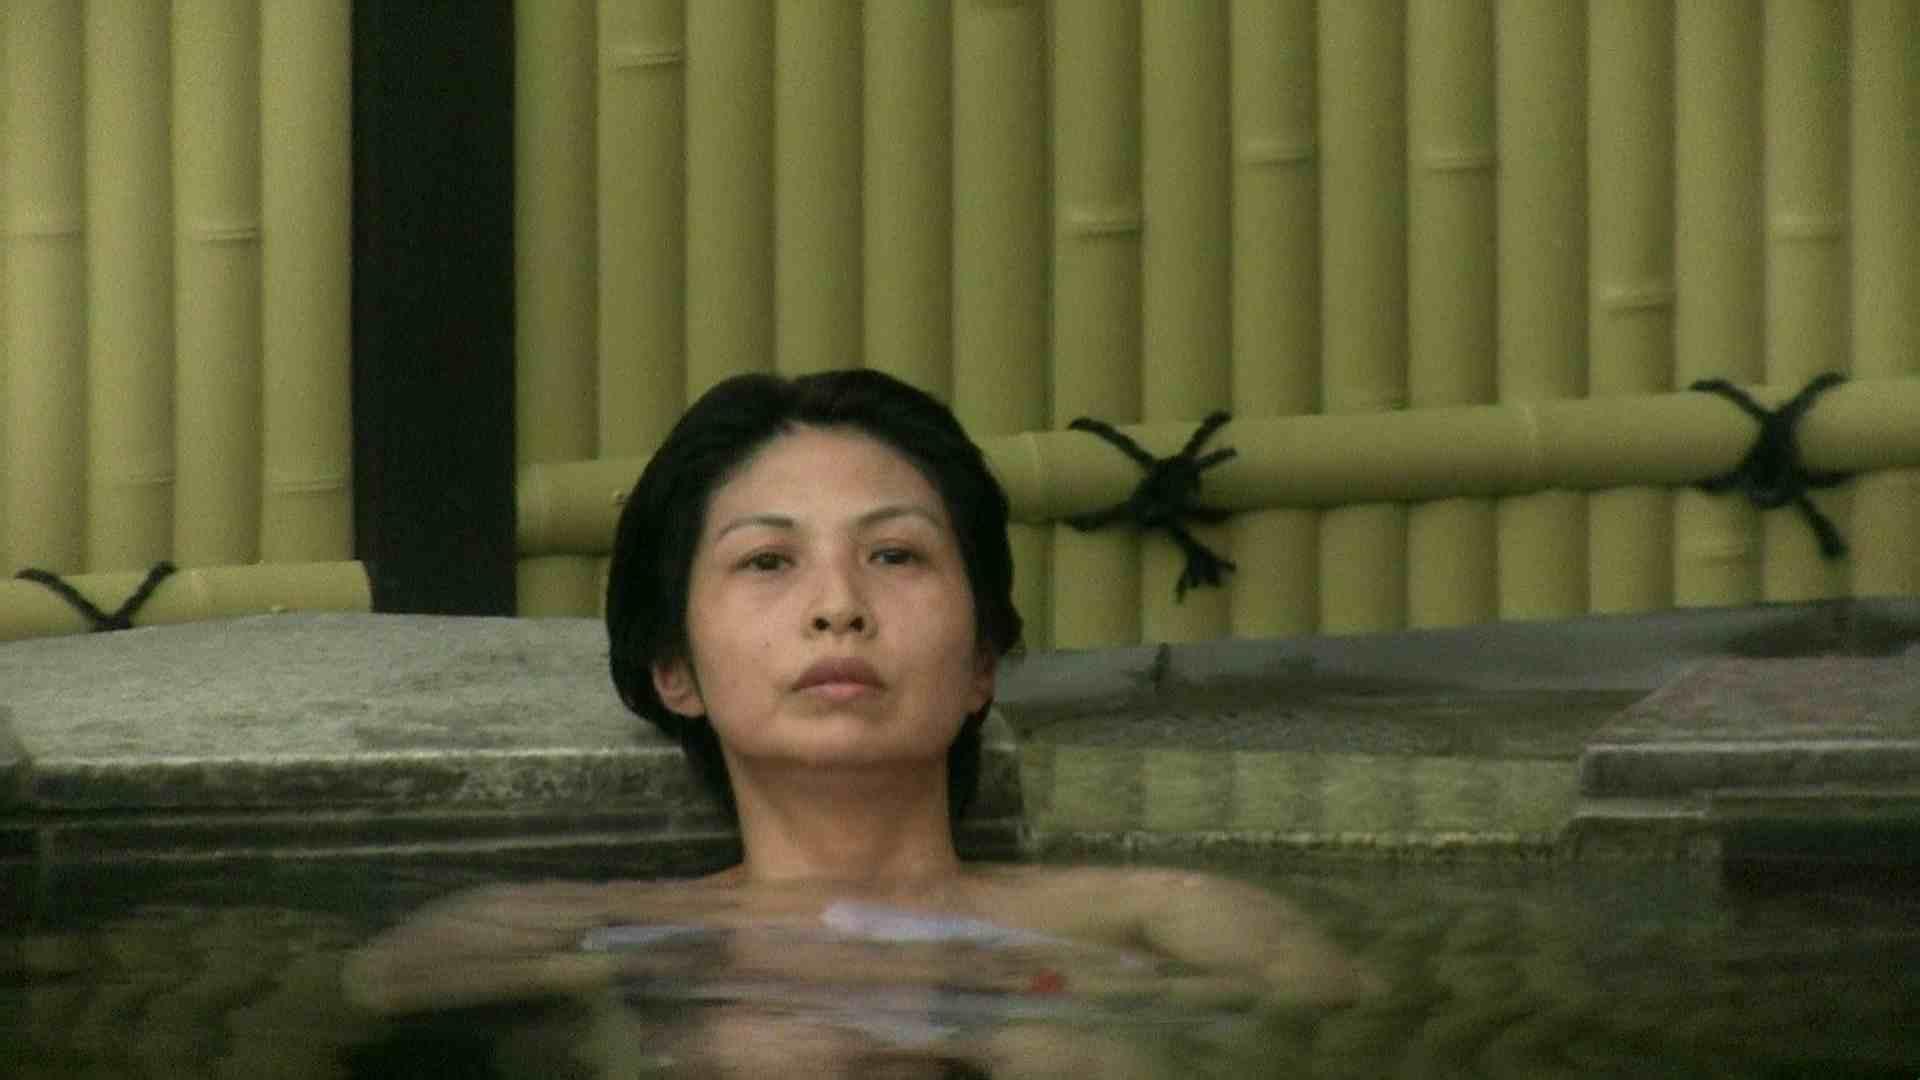 Aquaな露天風呂Vol.636 0  45連発 12